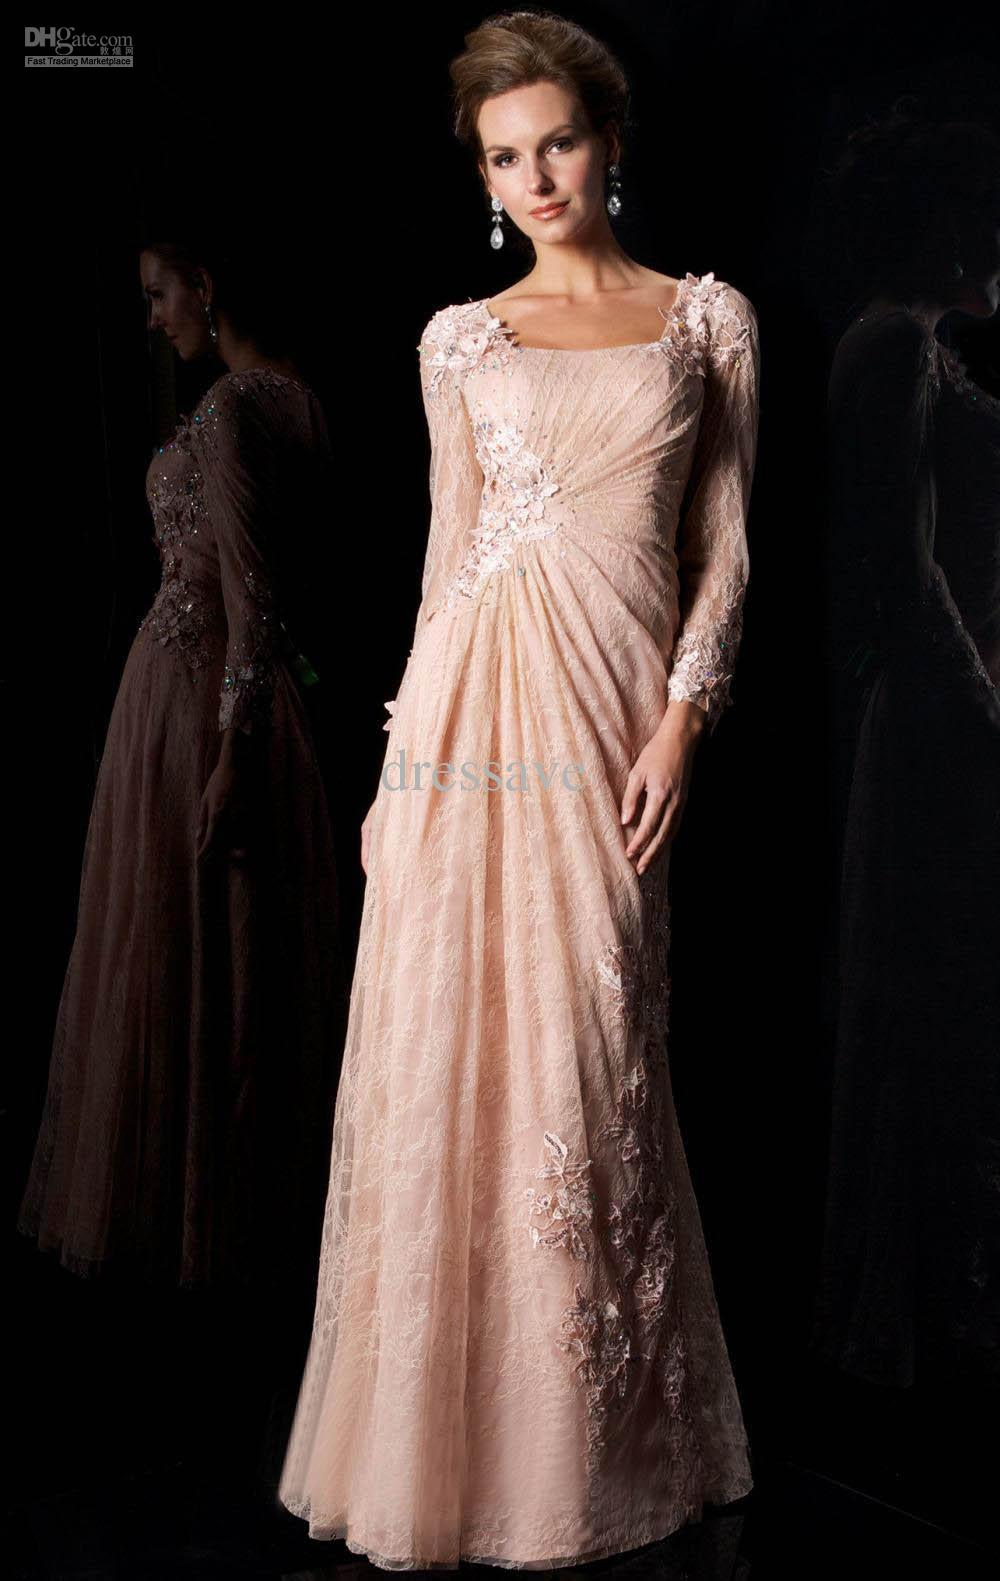 Long Dresses With Long Sleeves Photo Album - Reikian